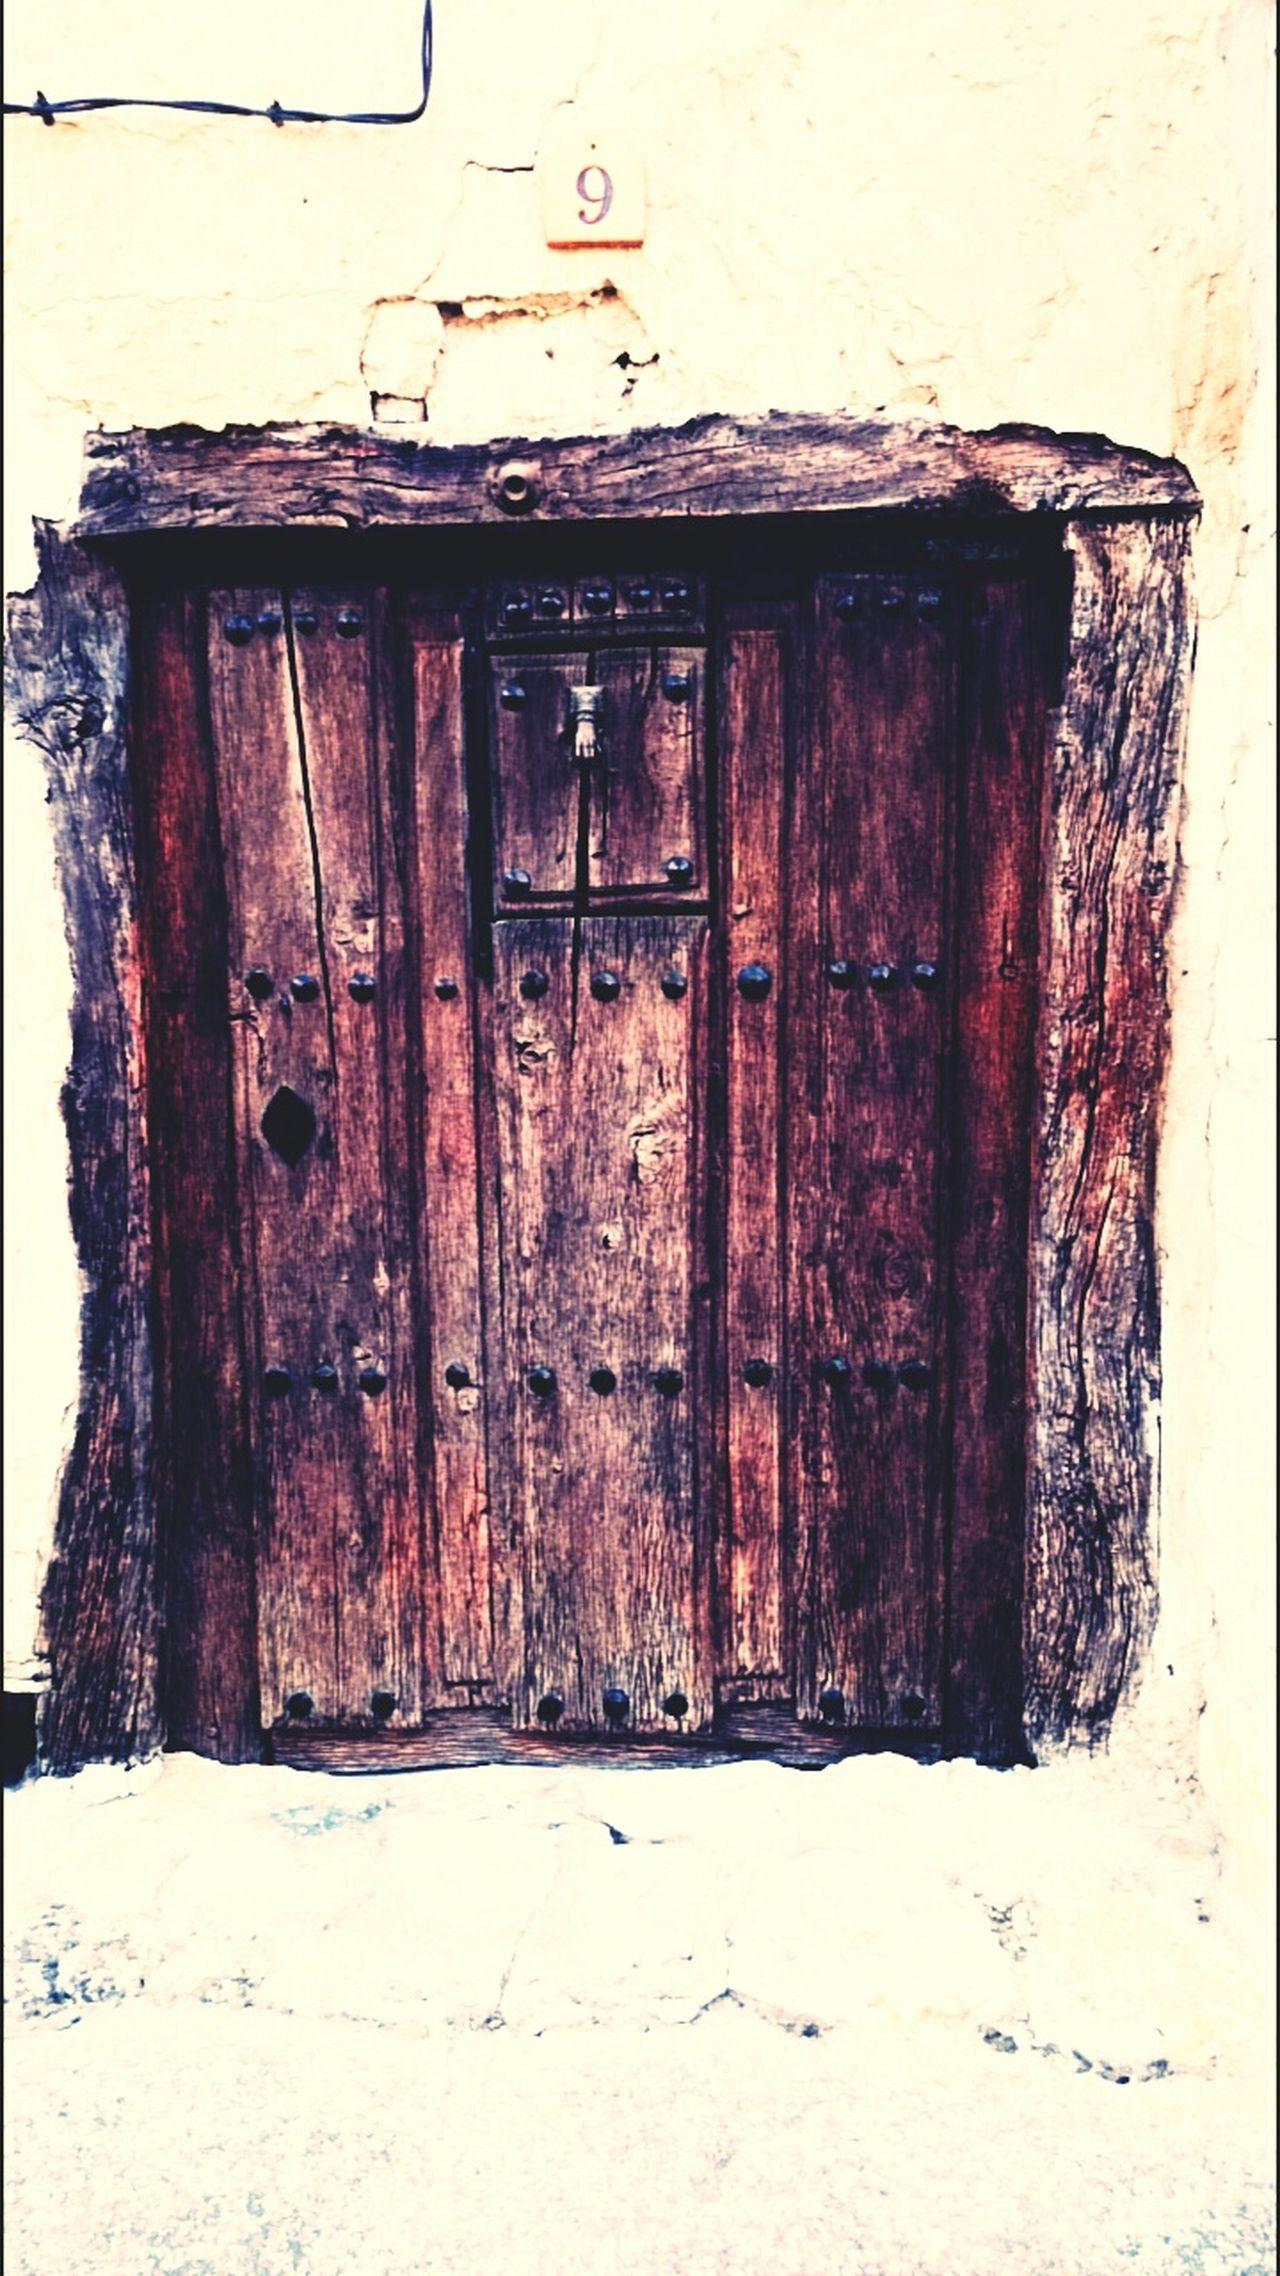 Old Buildings Old House Door Old Door Old Doors Vintage Vintage Photo Vintage Moments The Architect - 2016 EyeEm Awards